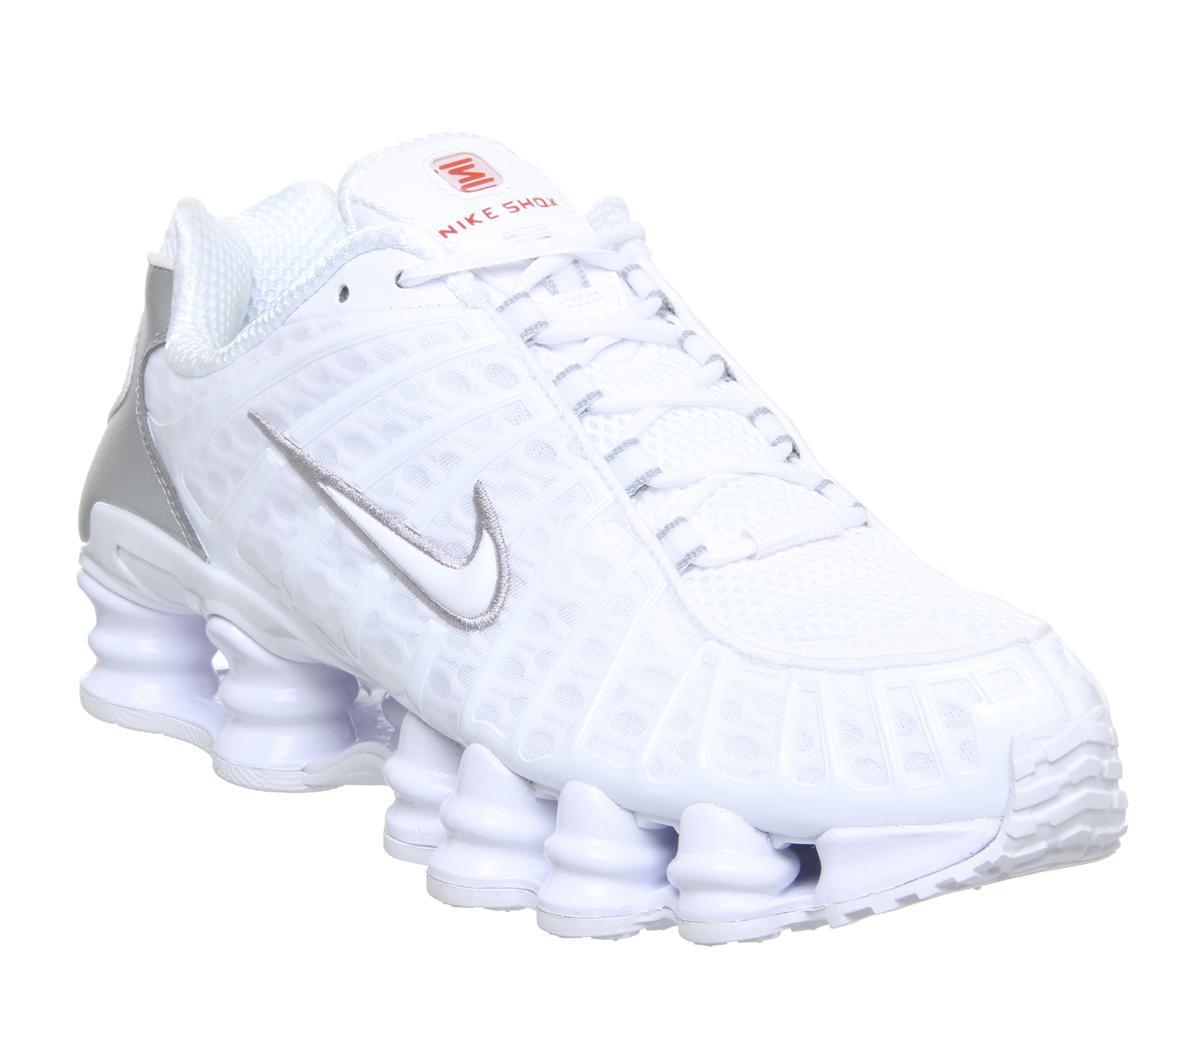 Nike Shox Tl Trainers